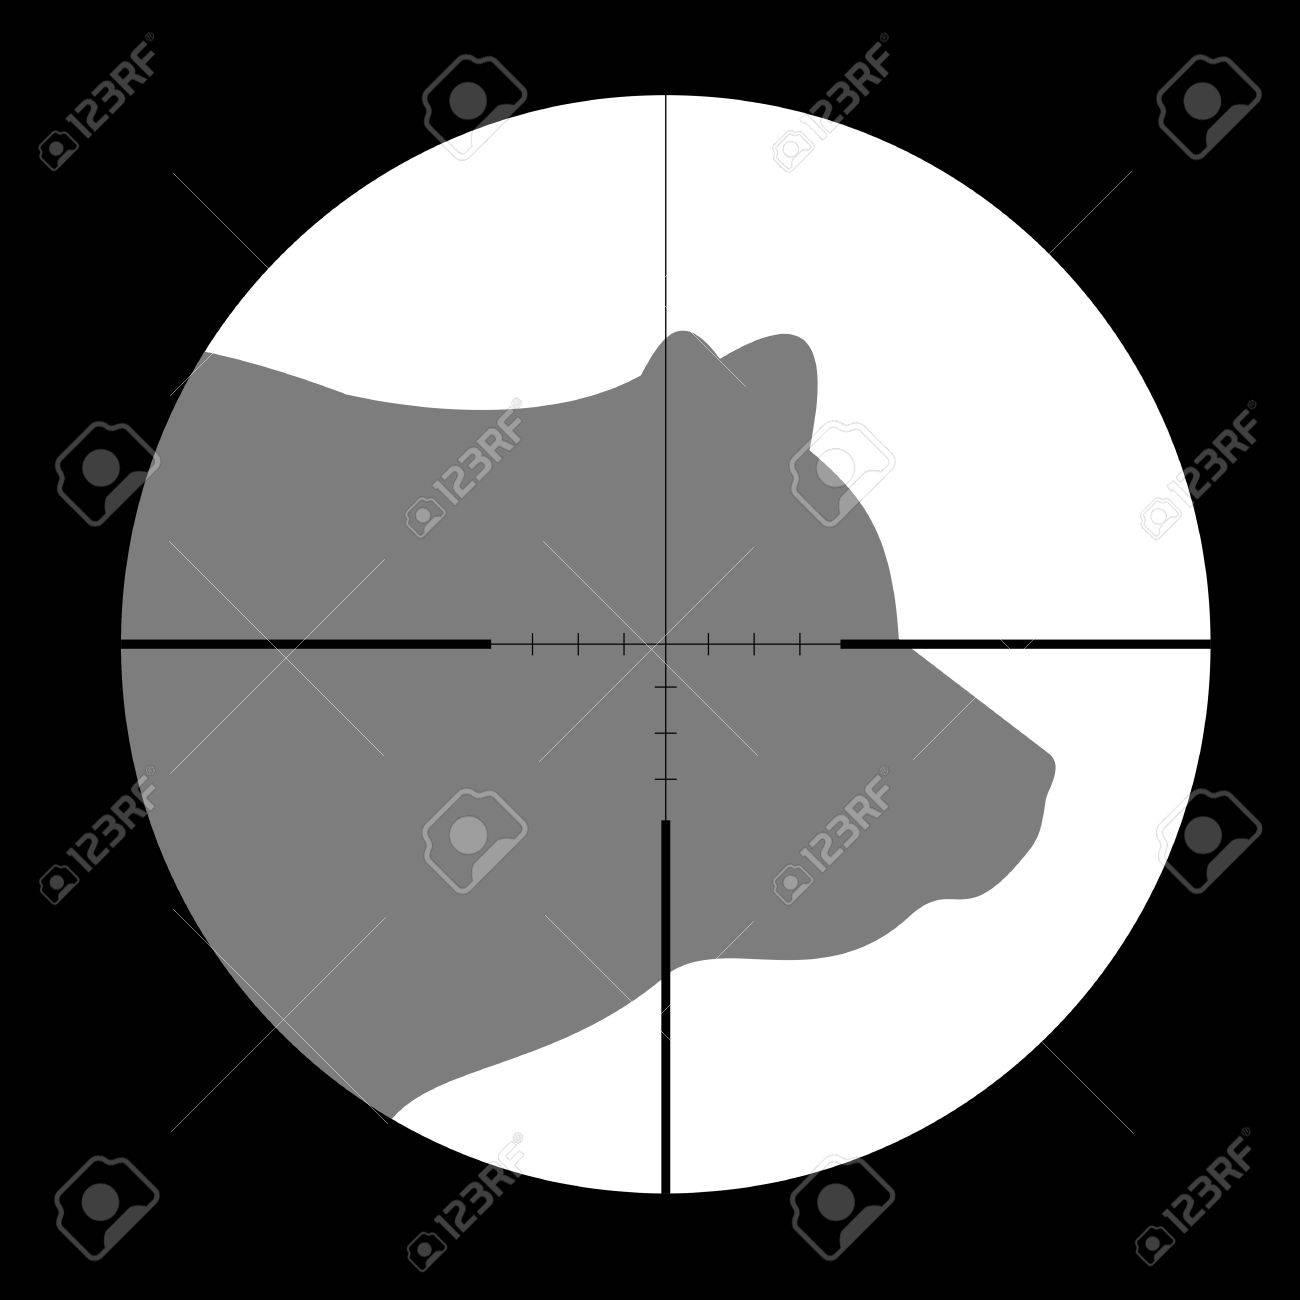 hight resolution of hunting season with bear in gun sight stock vector 51857936